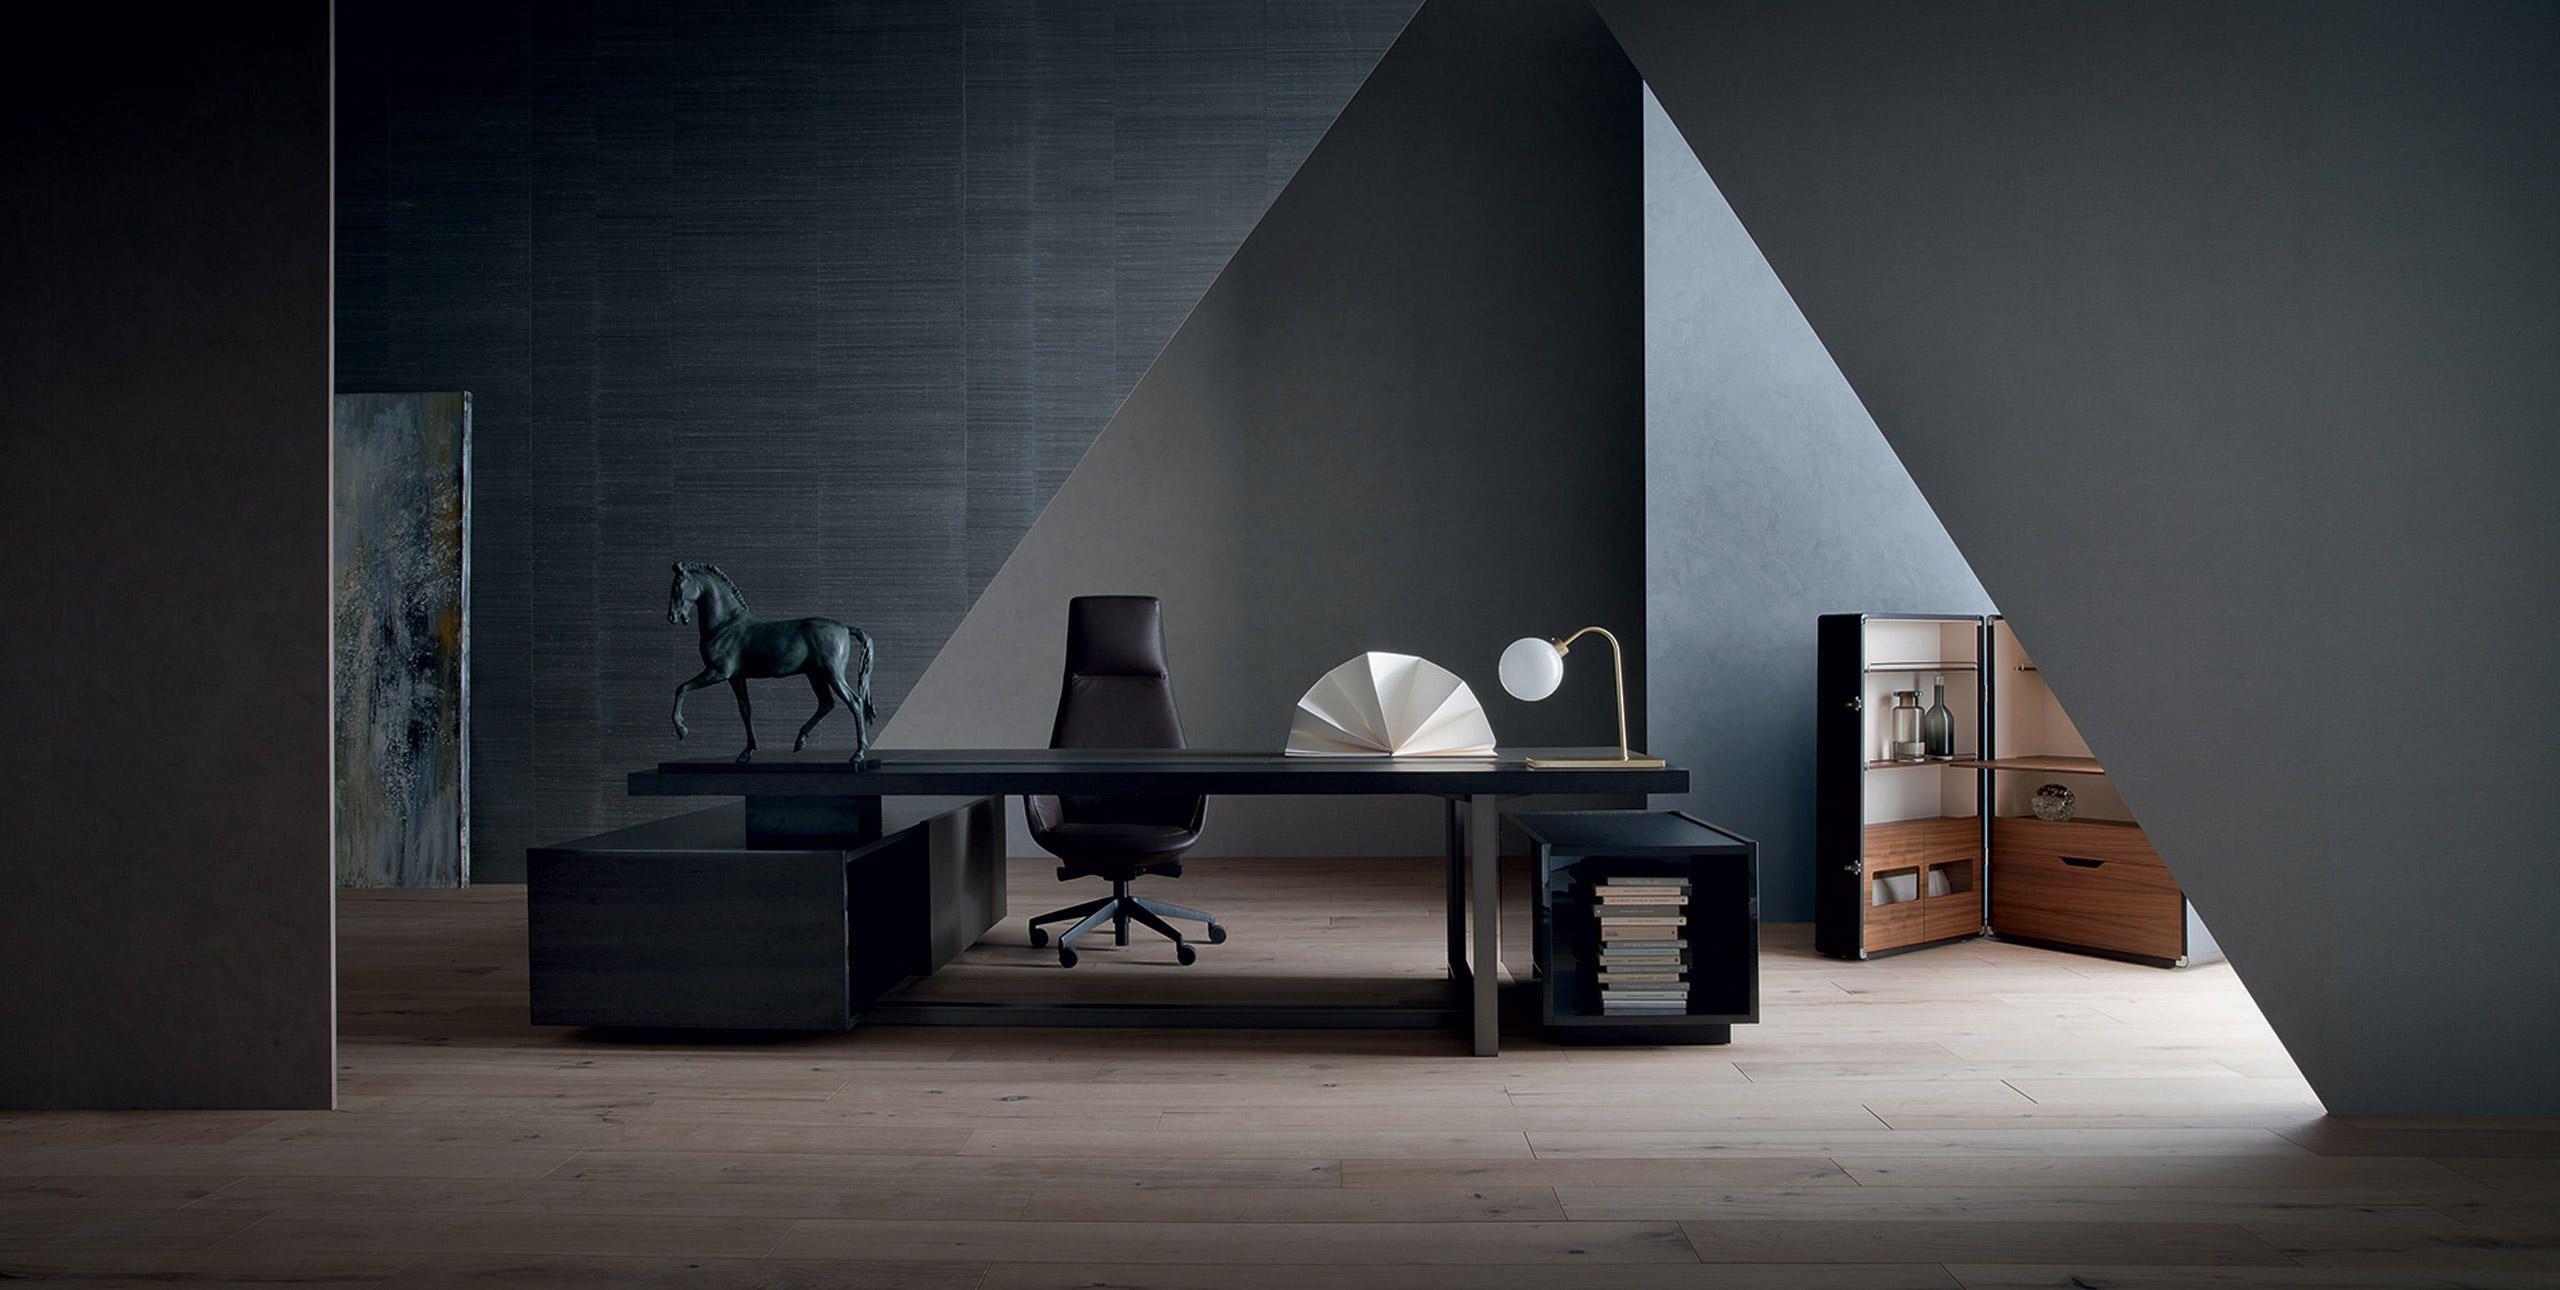 Jobs Desk By Poltrona Frau | Design Rodolfo Dordoni